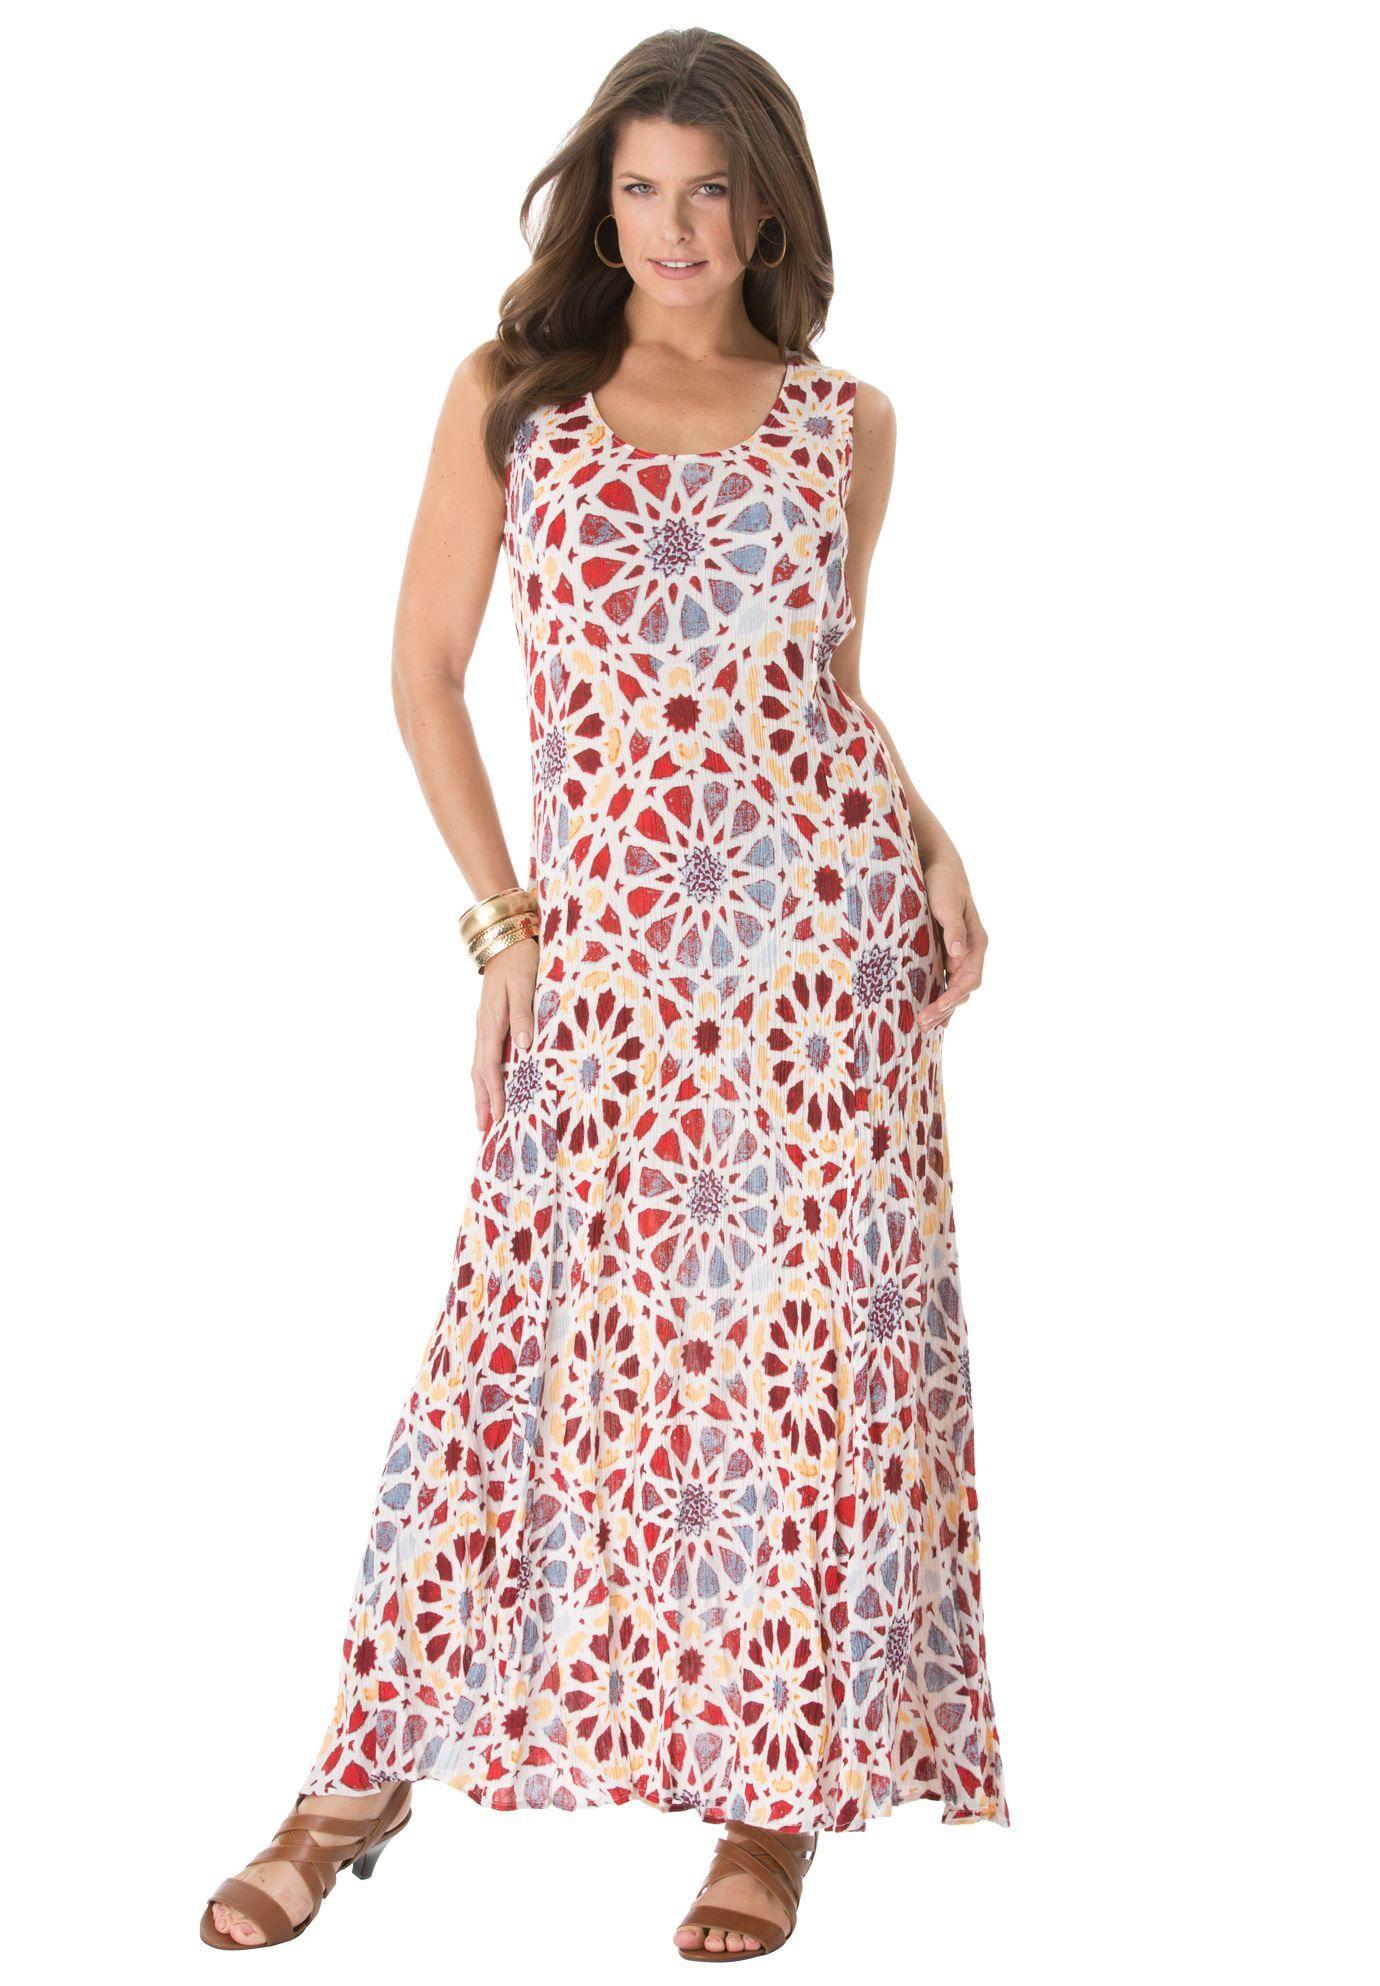 37++ Roamans plus size dresses ideas ideas in 2021